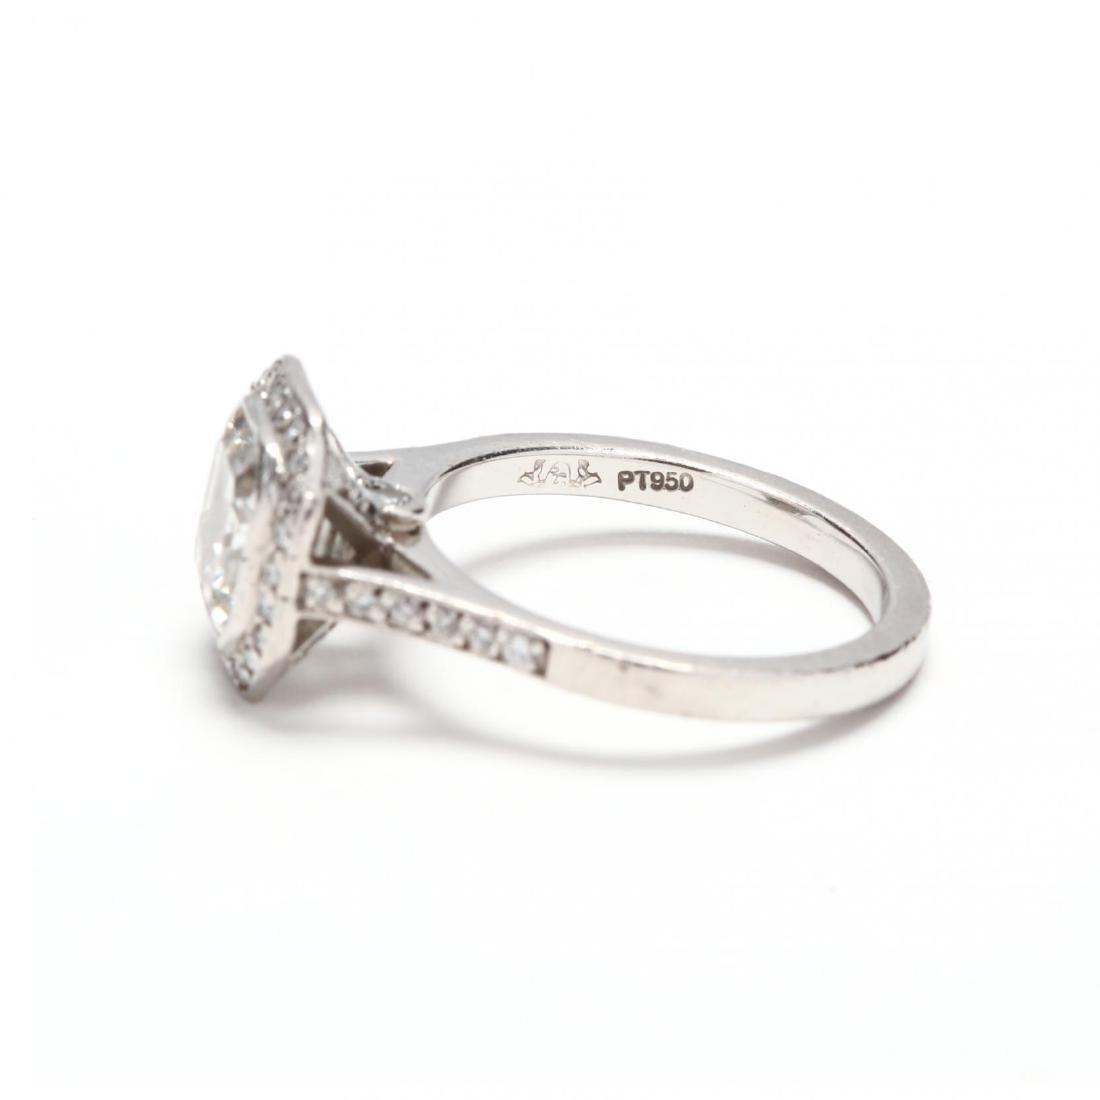 Platinum and Diamond Ring - 5